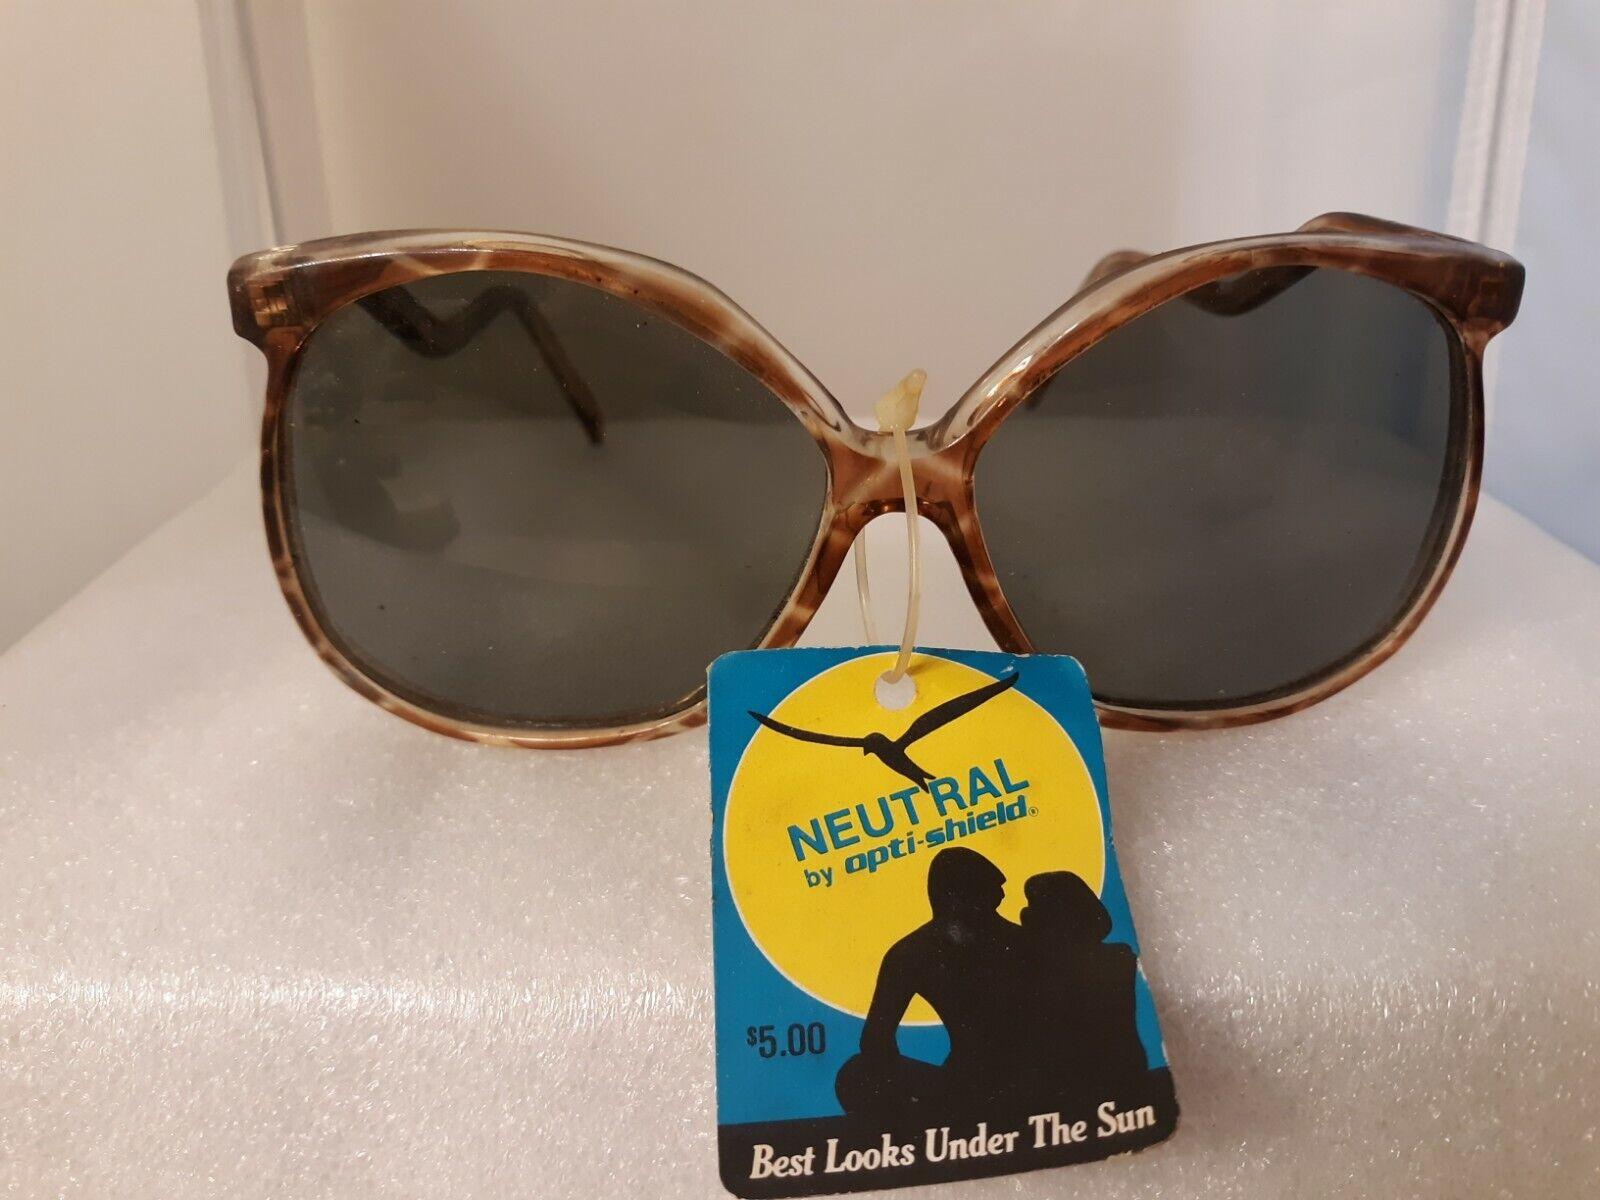 Vtg 80s Opti-Shield Retro Sunglasses NOS Mod Korea Fashion Accessories